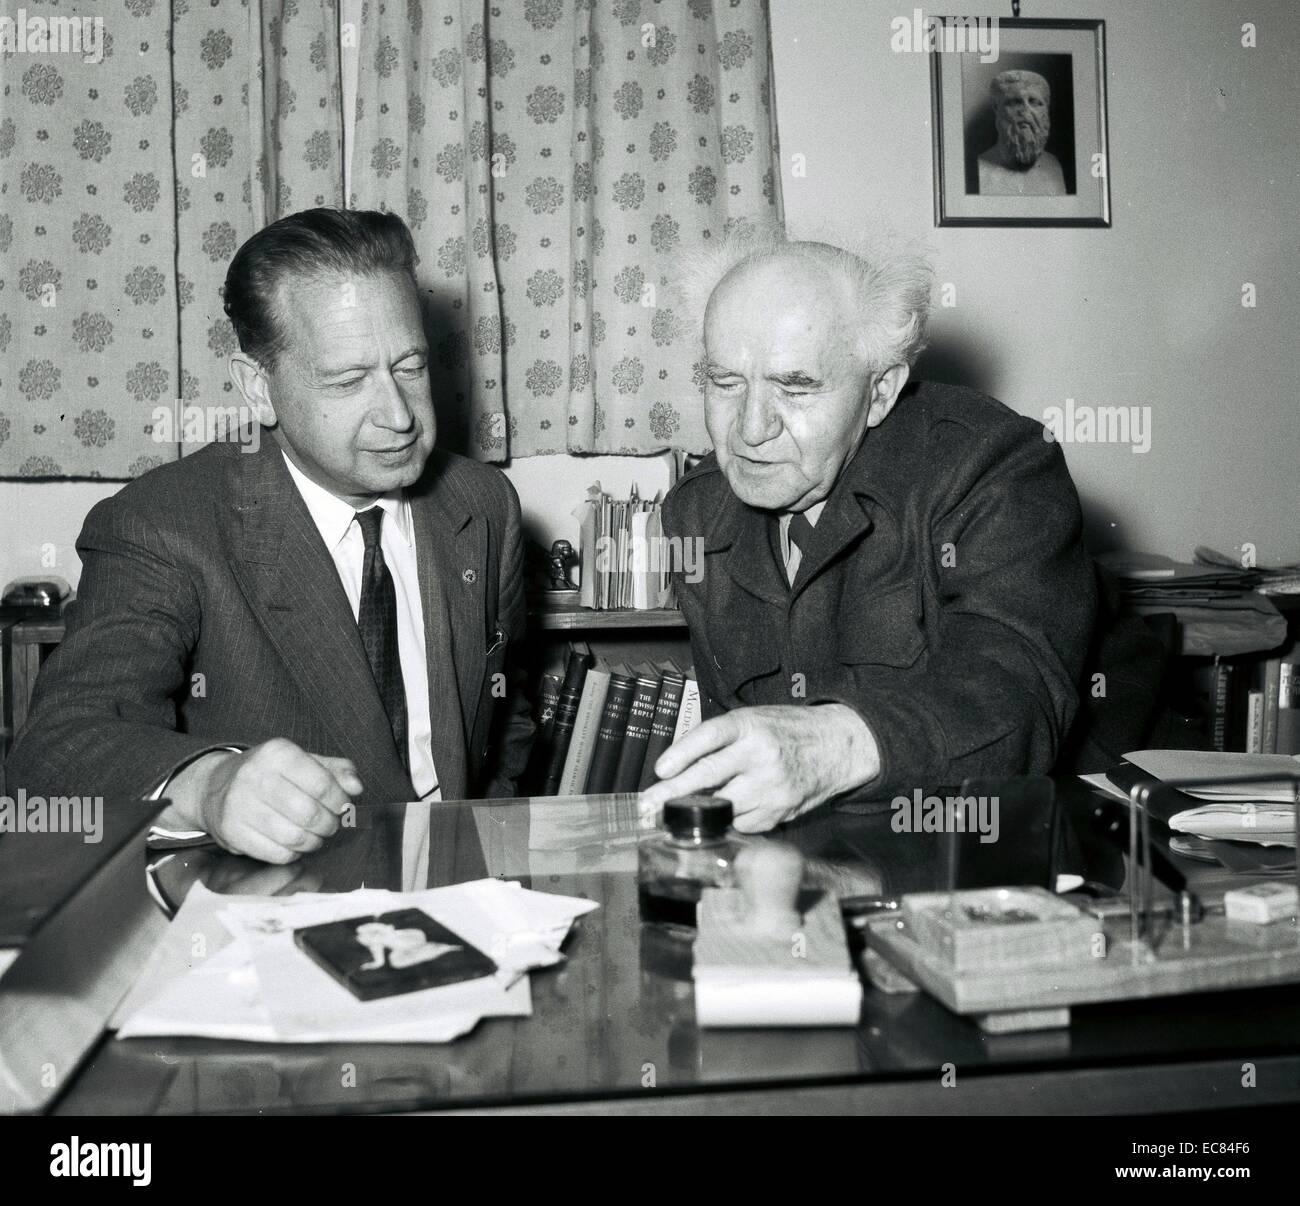 Photograph of Mr. Dag Hammarskjöld (1905-1961) and Israeli Prime Minister Ben Gurion (1886-1973) . Dated 1959 - Stock Image